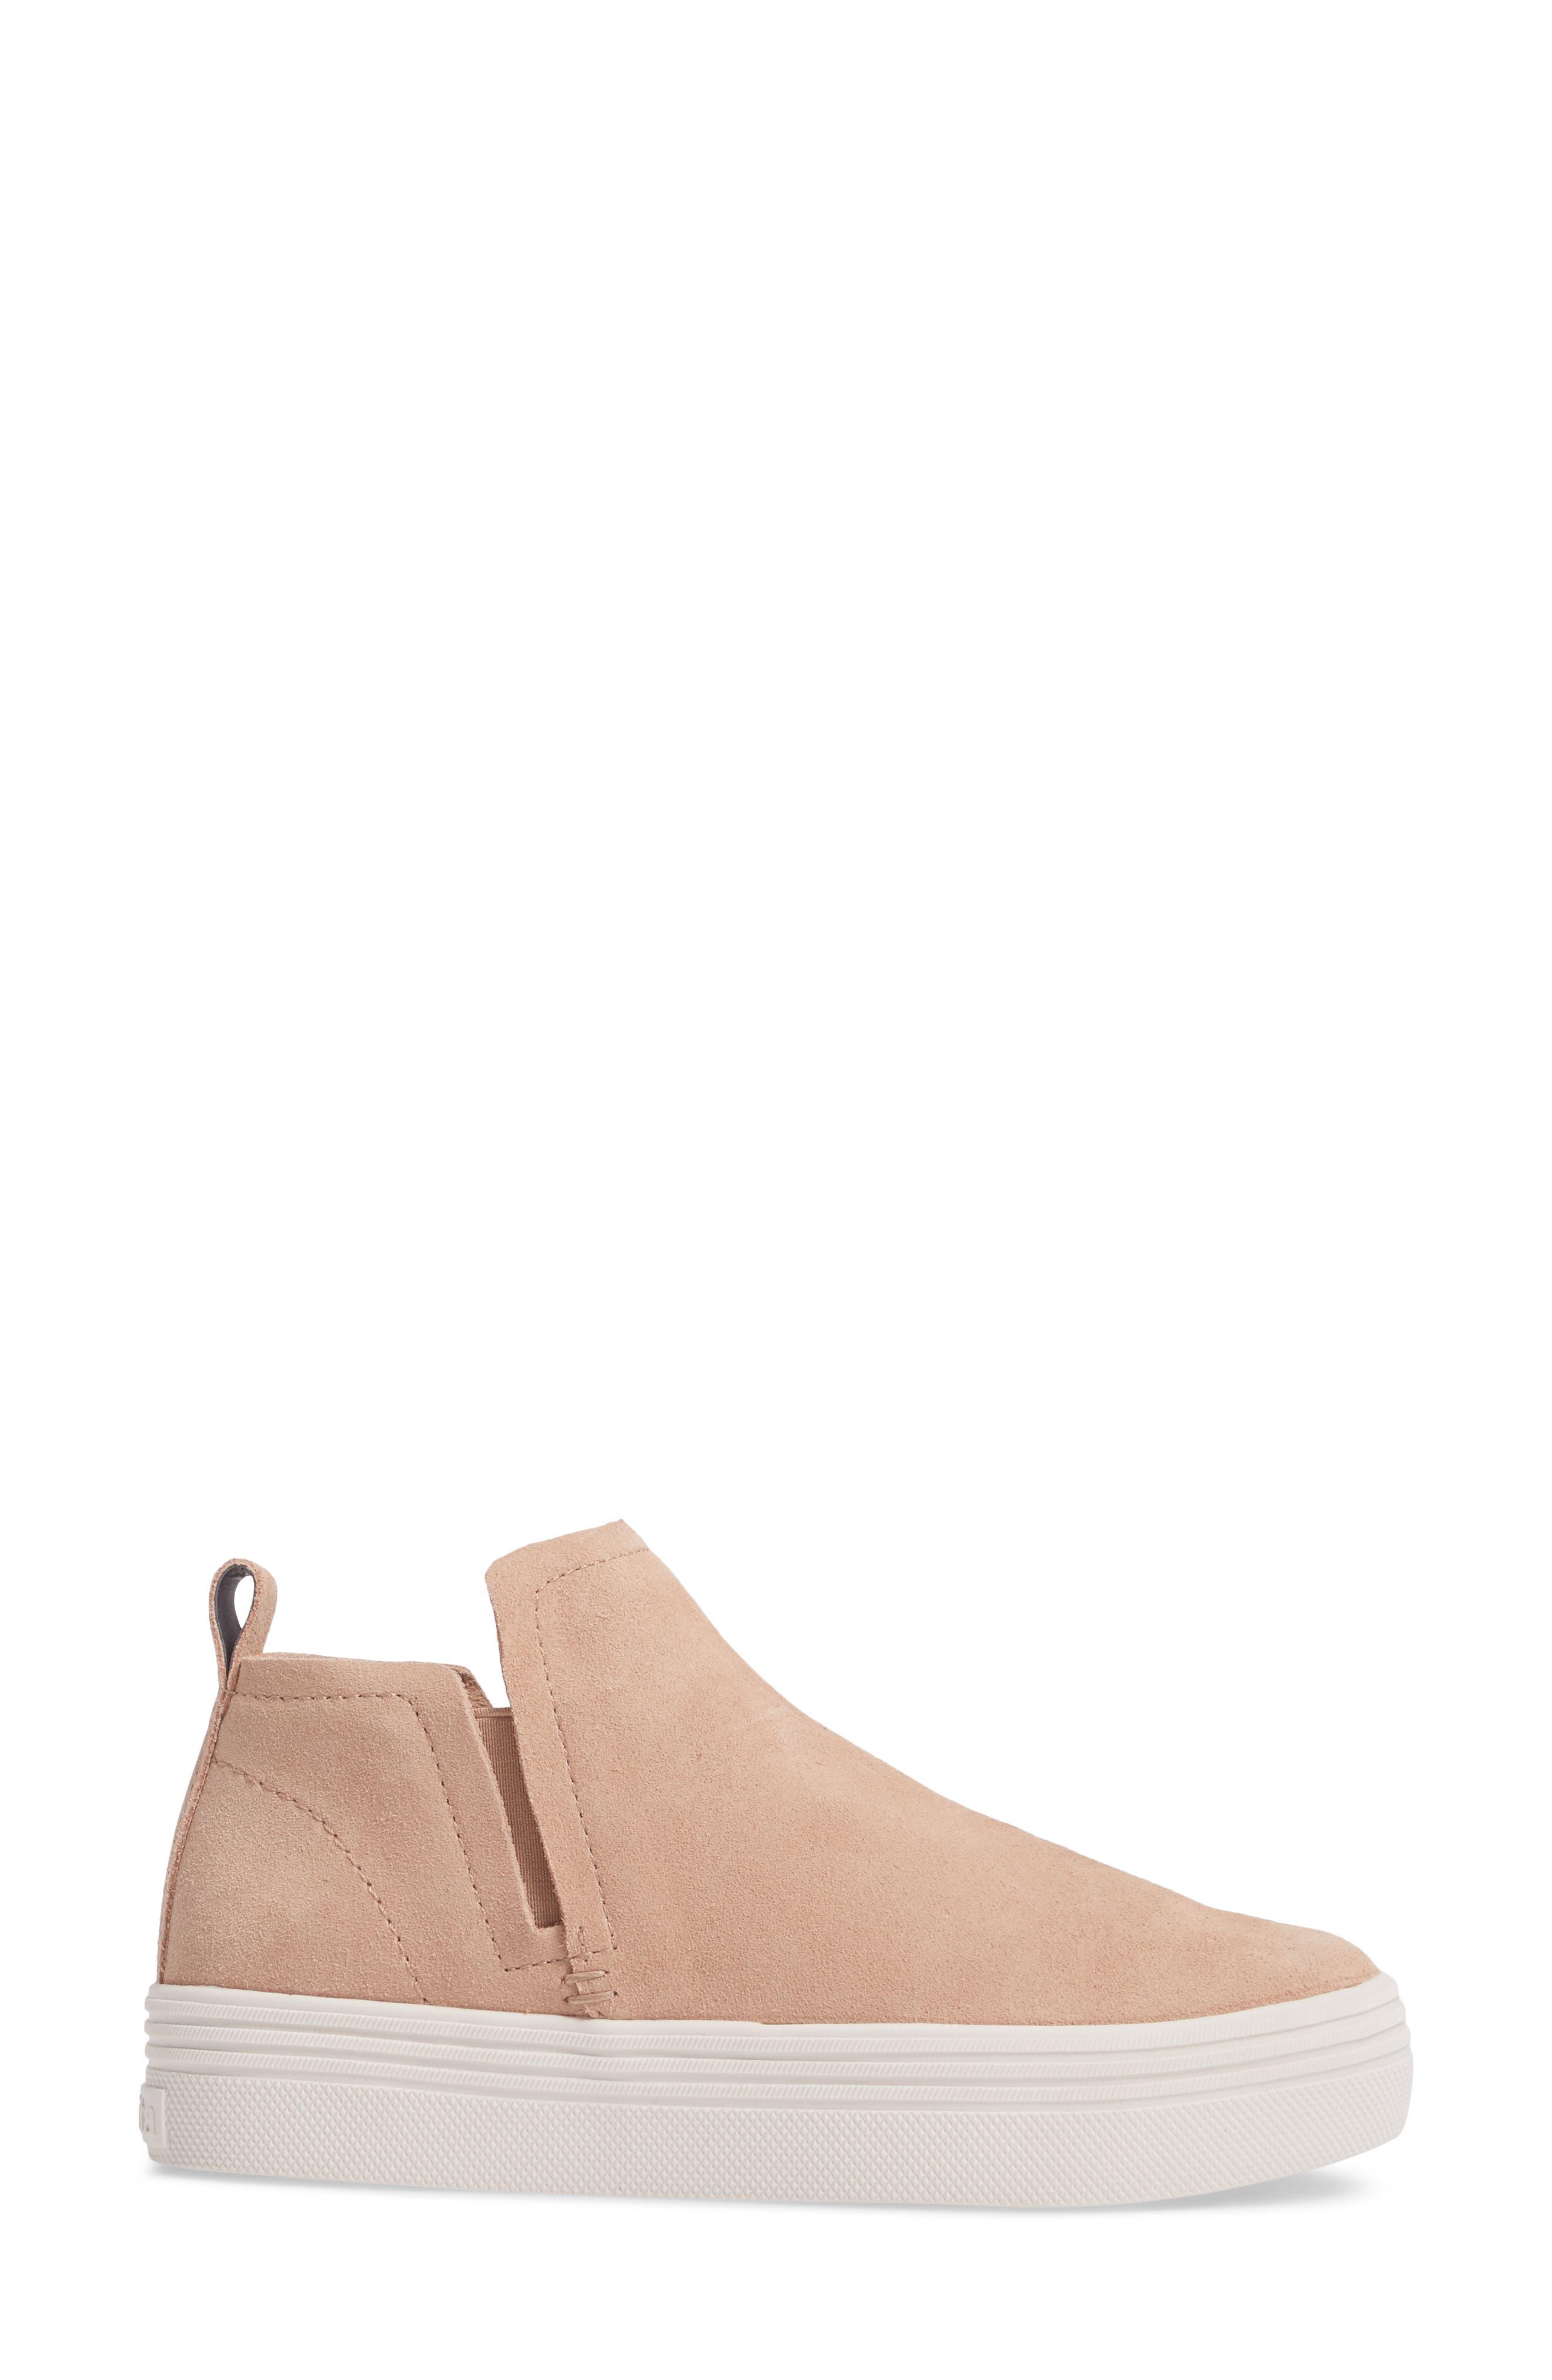 Tate Slip-On Sneaker,                             Alternate thumbnail 3, color,                             Blush Suede